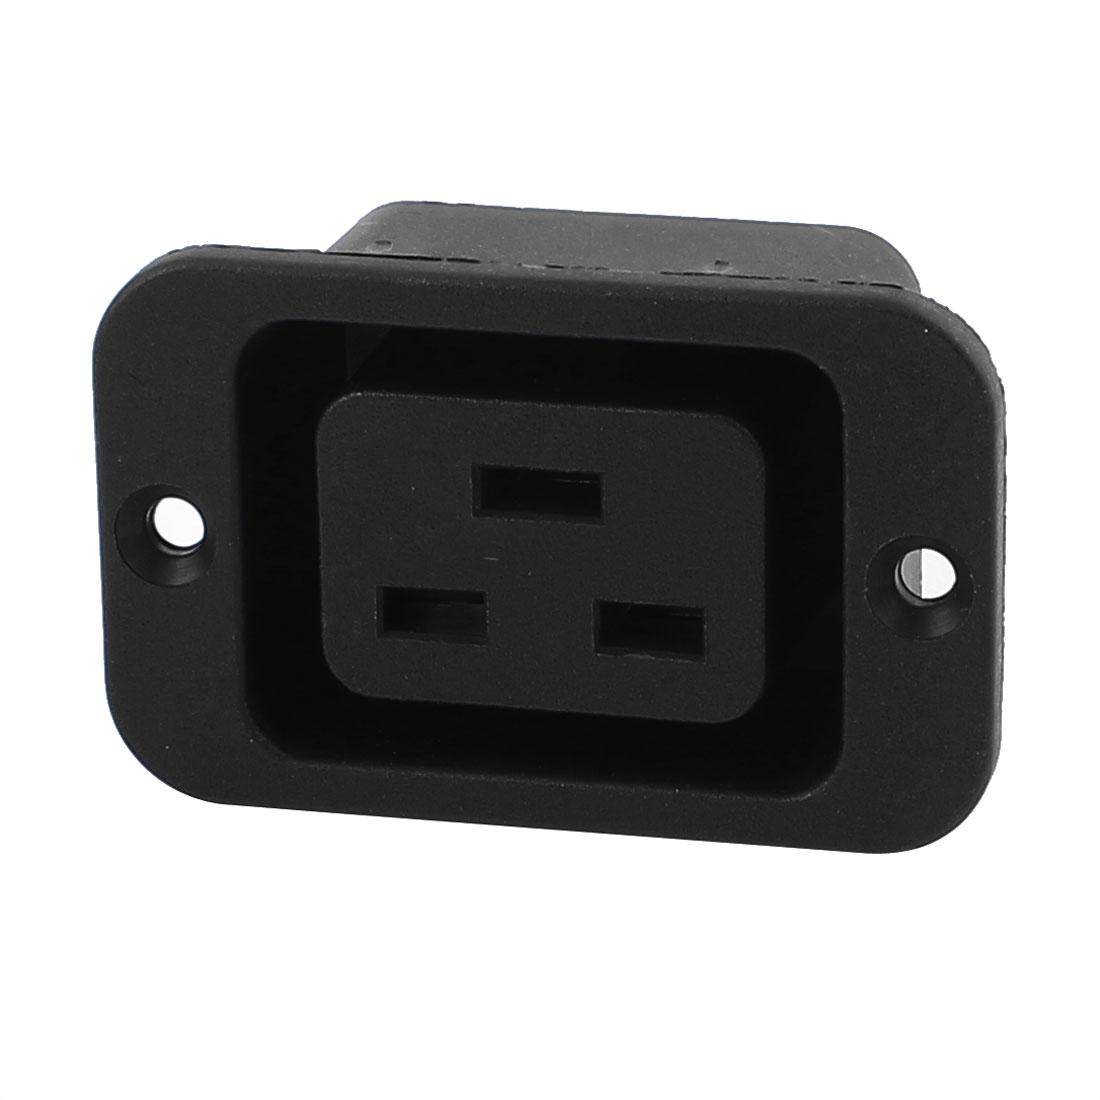 AC 250V 16A 3P Rewirable IEC19 Series C19 Female Socket w Screw Holes